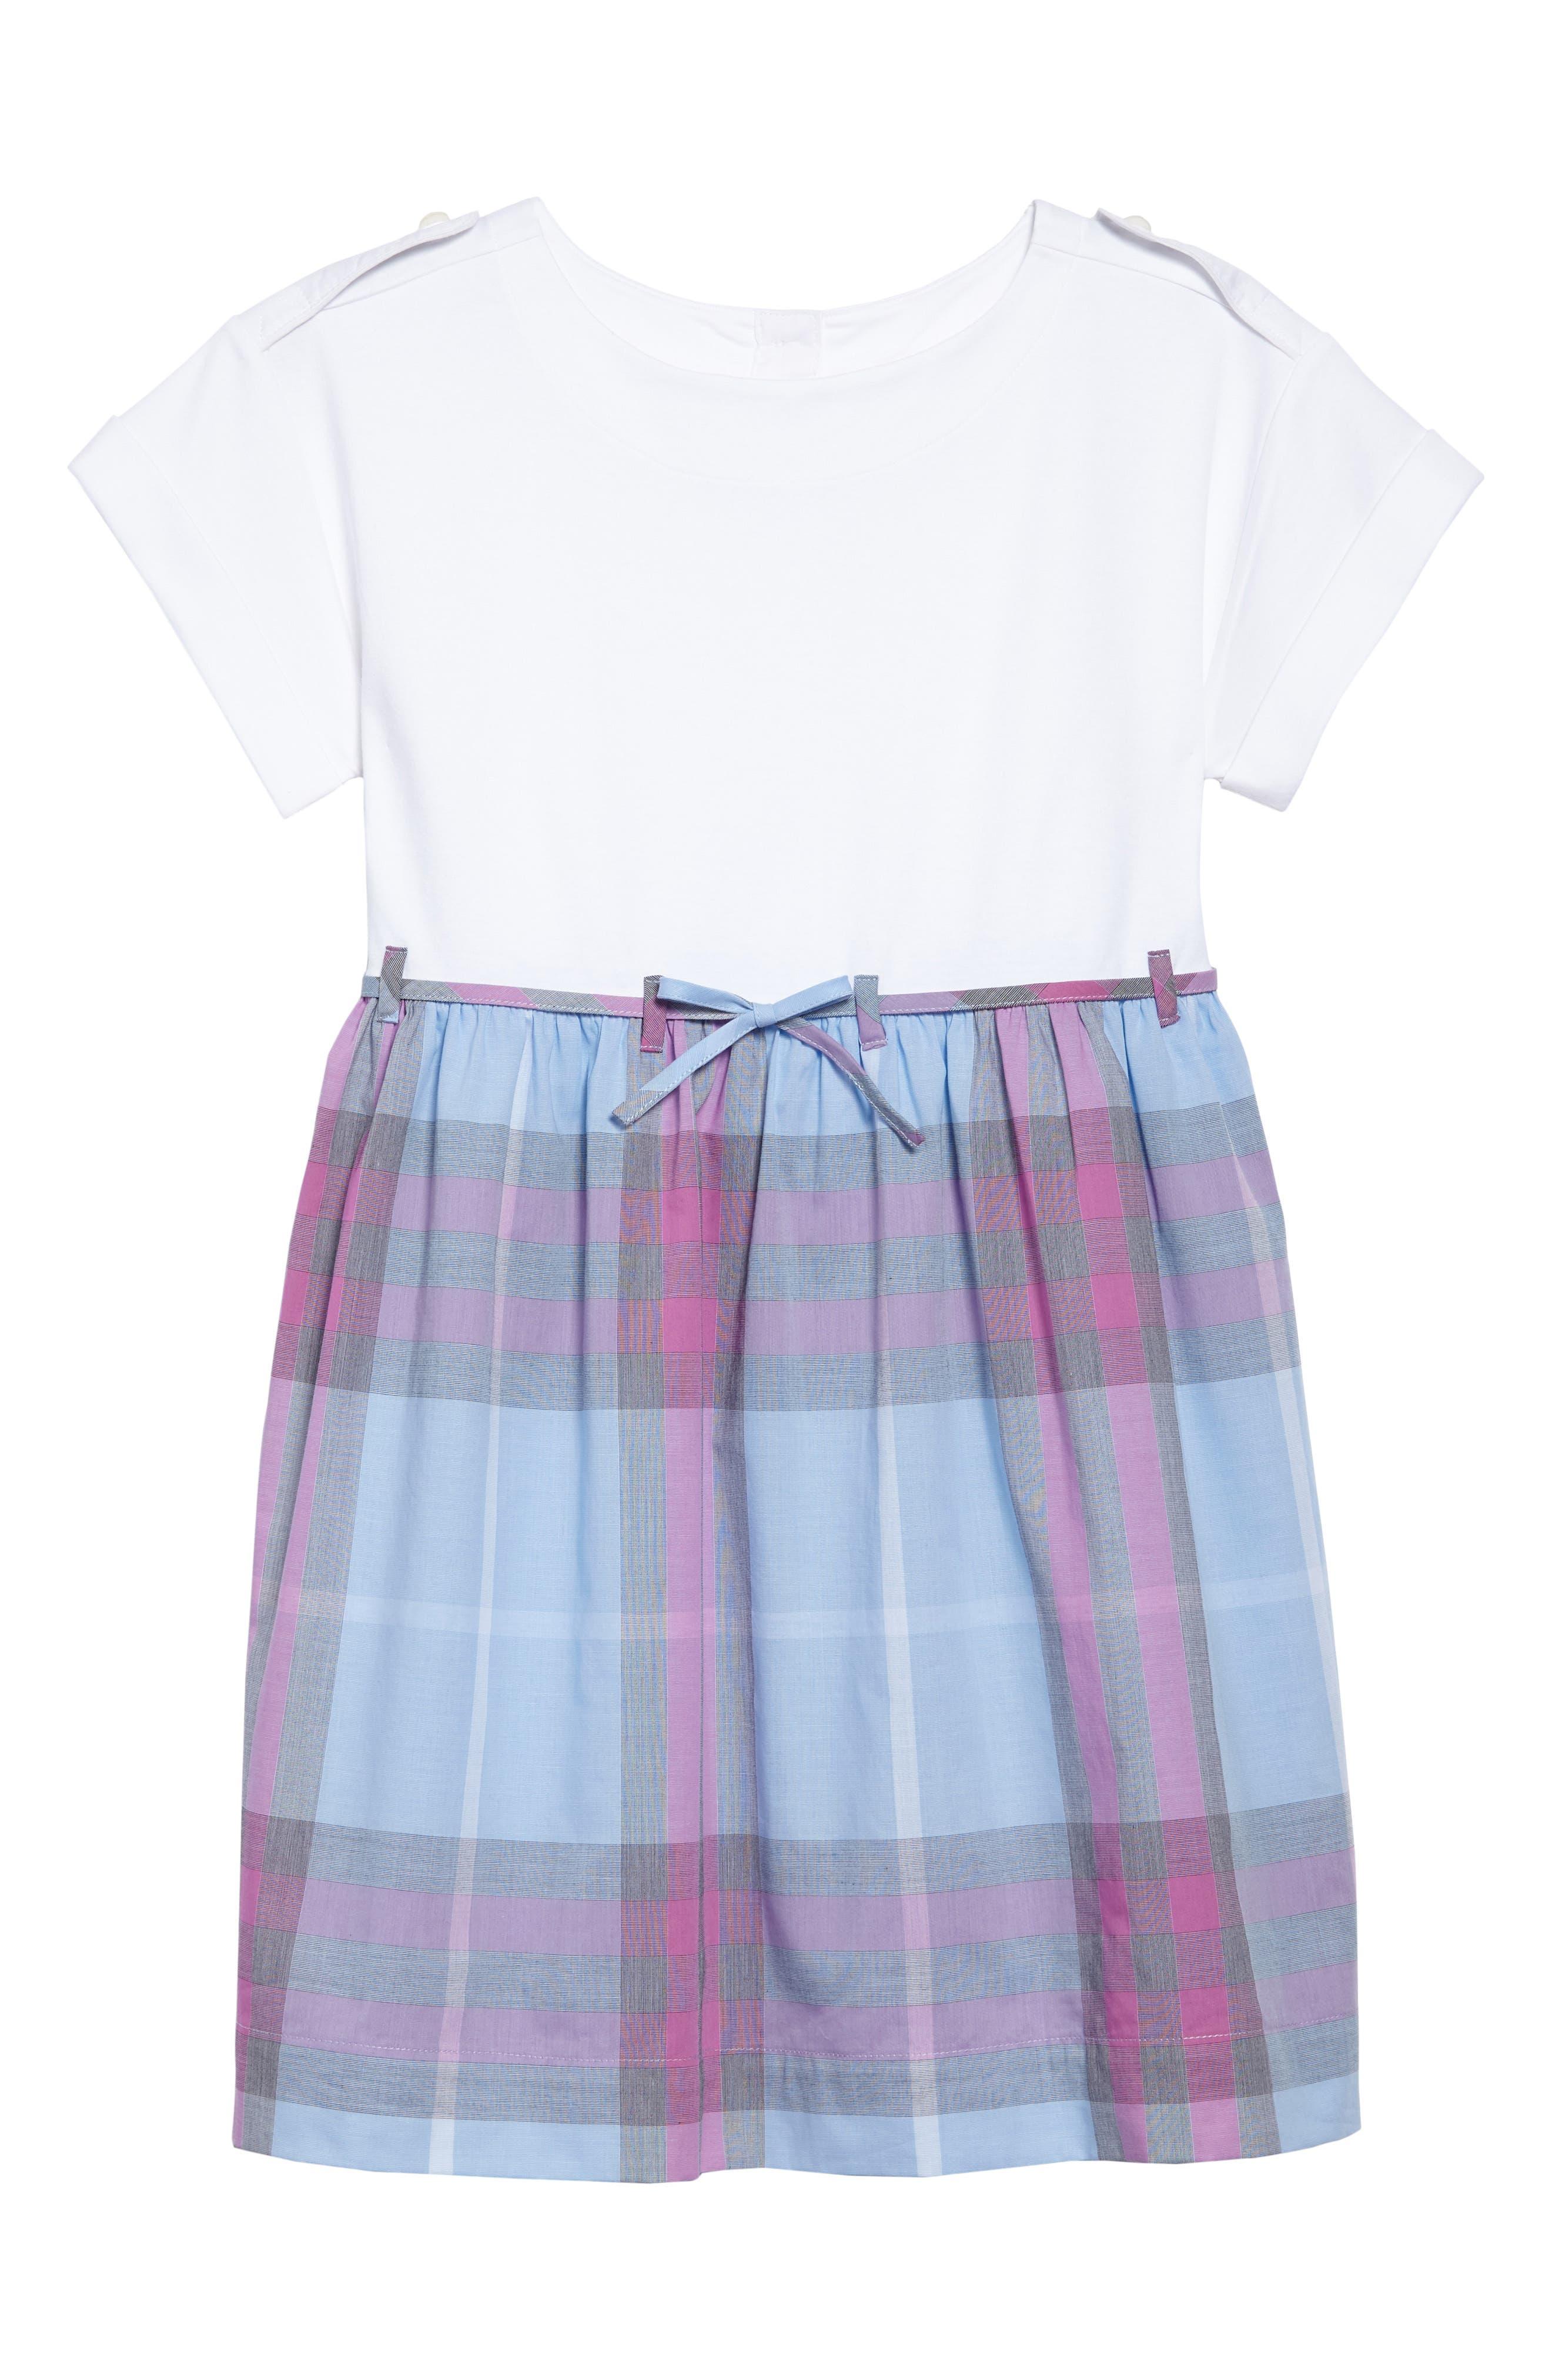 Alternate Image 1 Selected - Burberry Rhonda Check Dress (Little Girls & Big Girls)